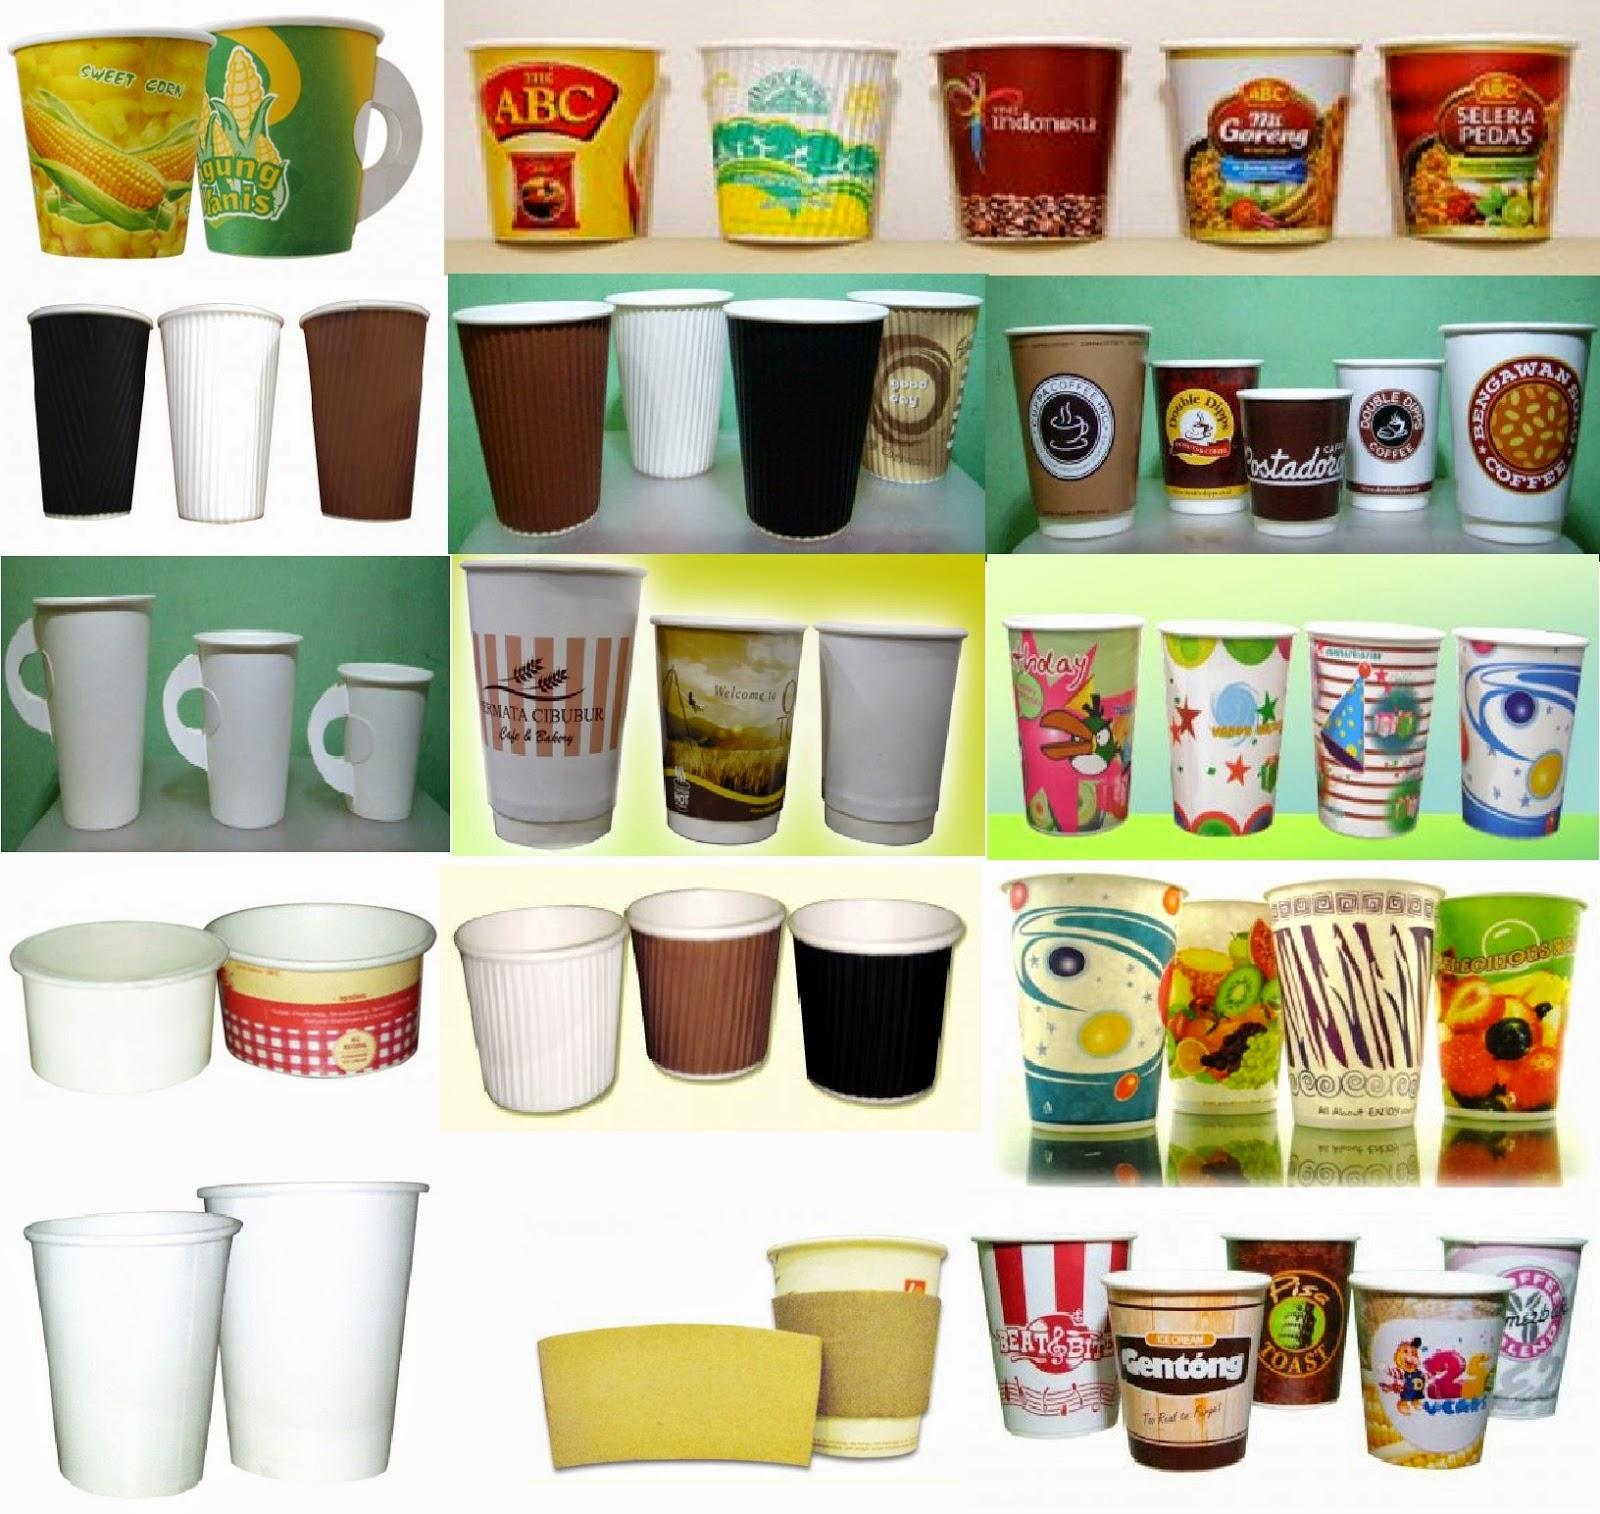 Distributor Agen Jual Paper Cup Gelas Kertas Untuk Ice